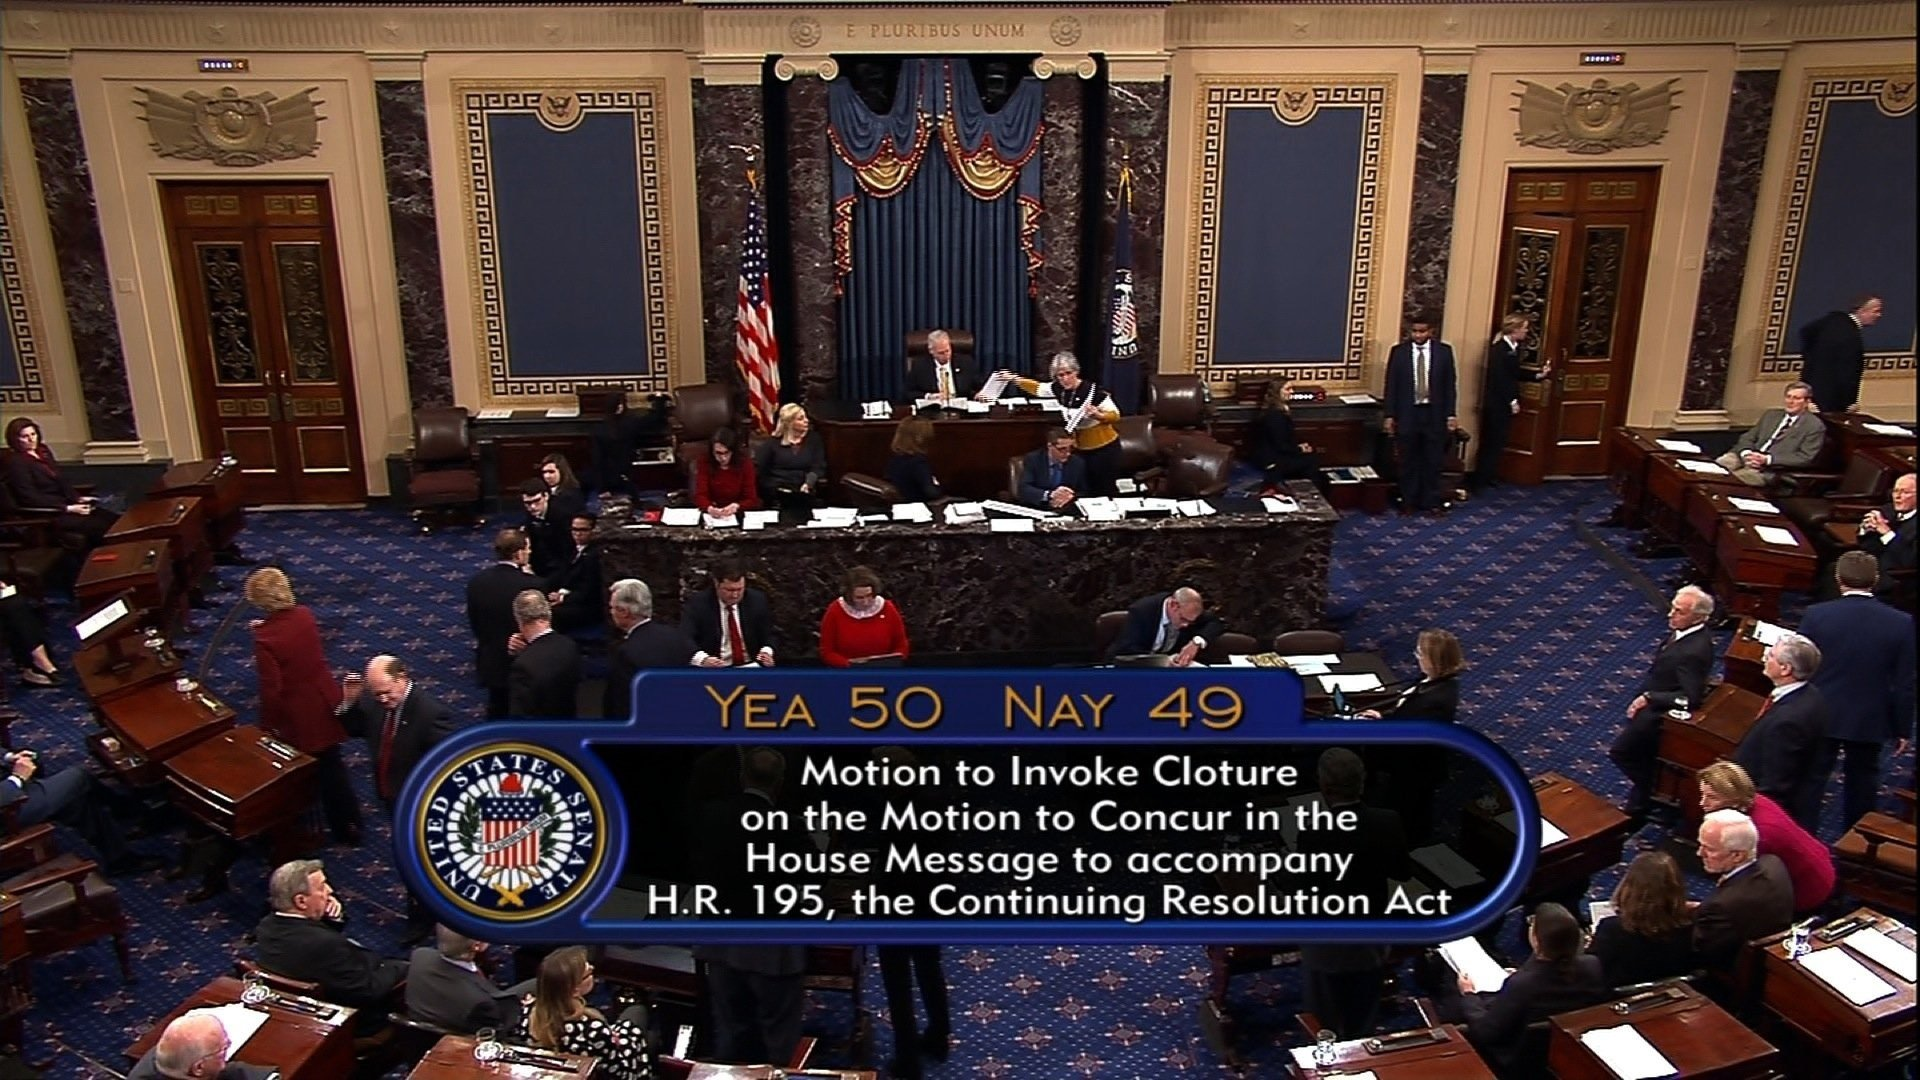 (Senate TV image)